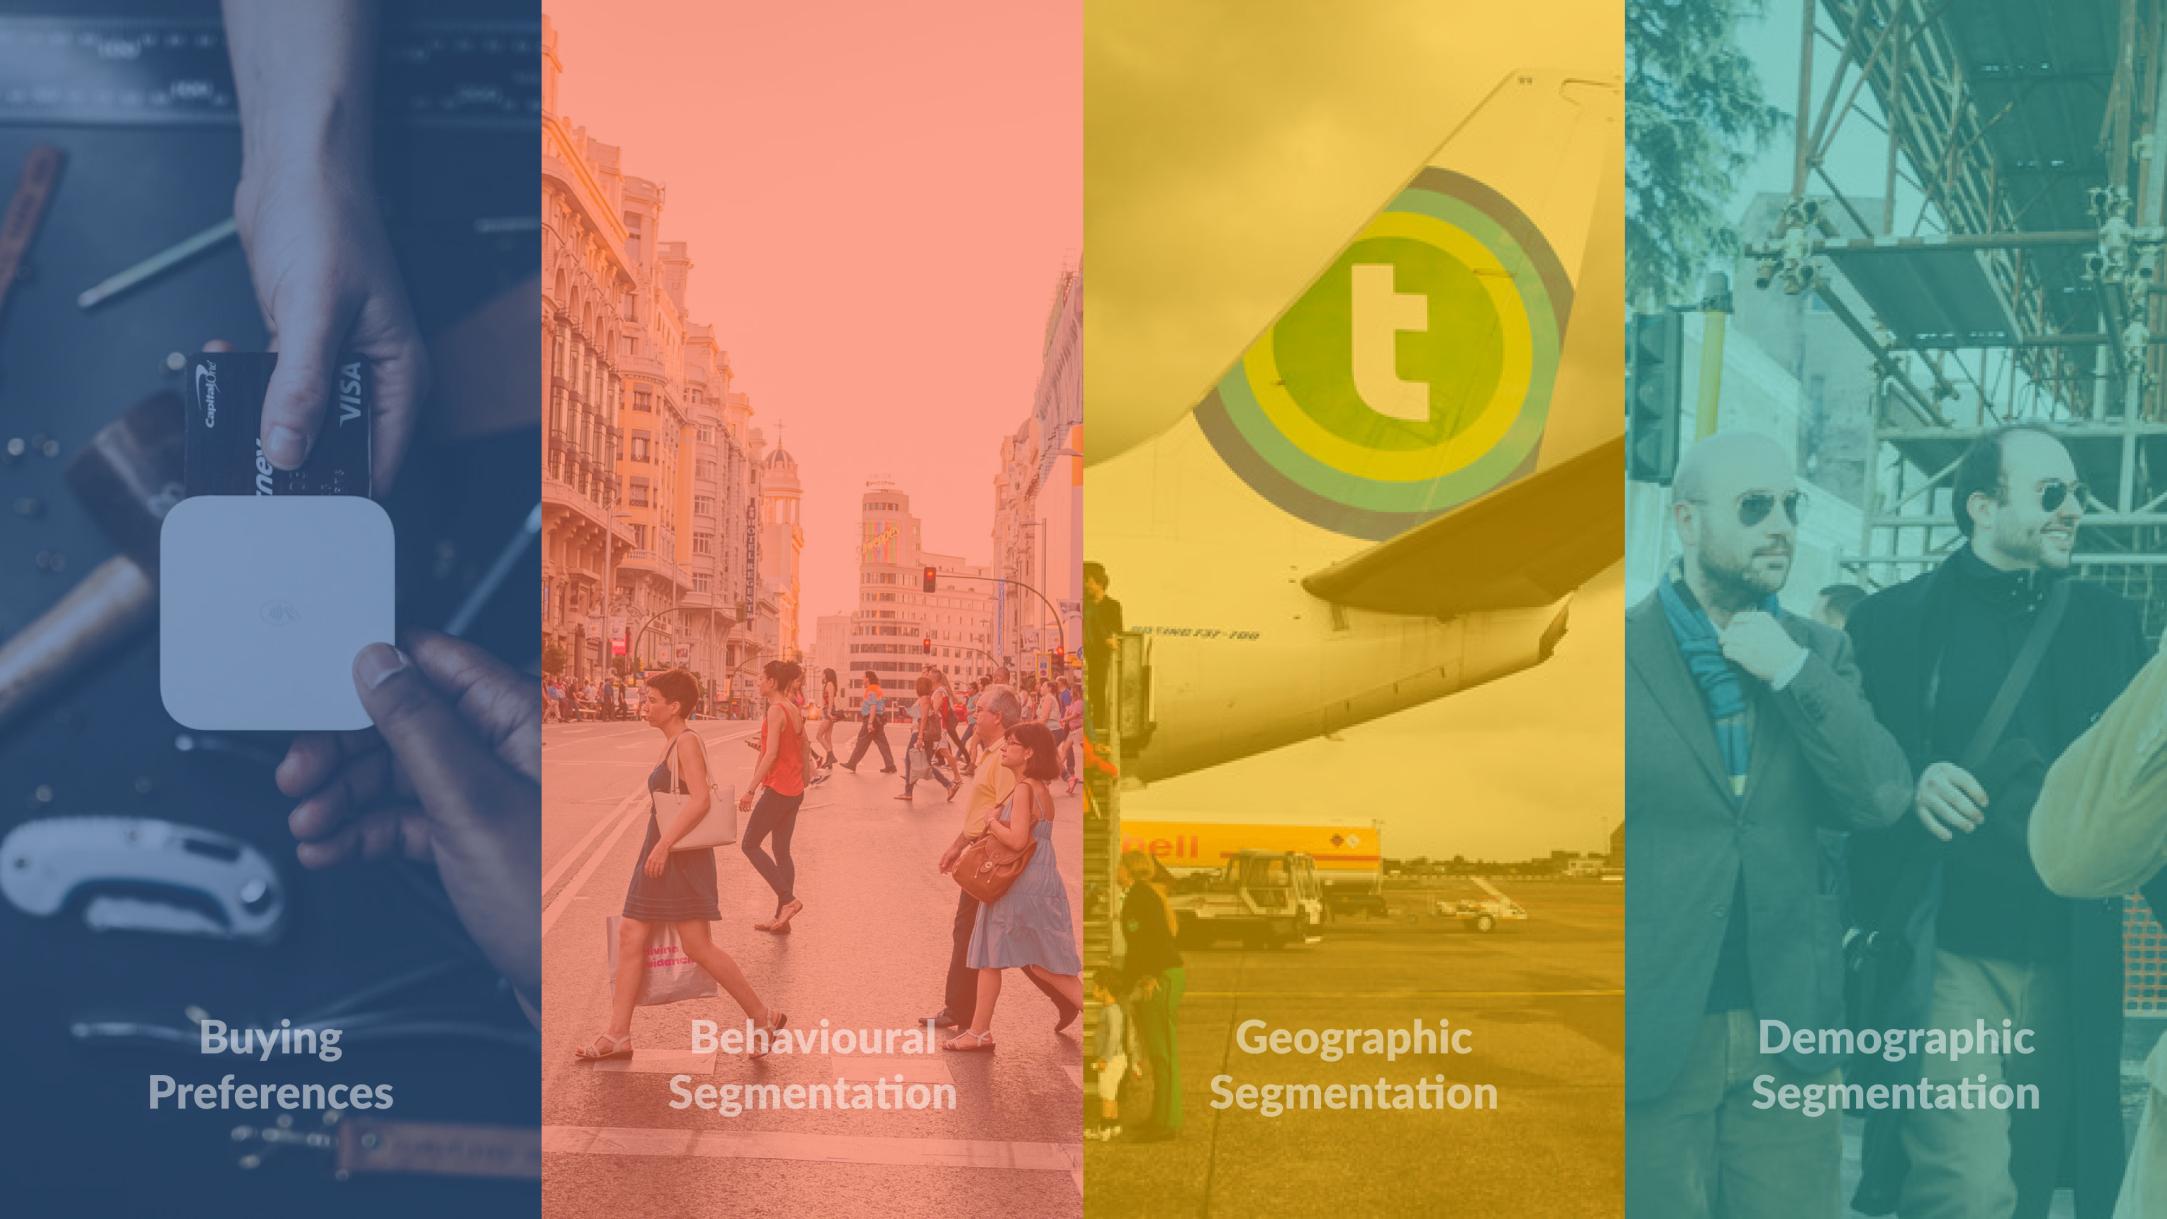 The 4 Types of Market Segmentation; Buying Preferences, Behavioural Segmentation, Geographic Segmentation & Demographic Segmentation.